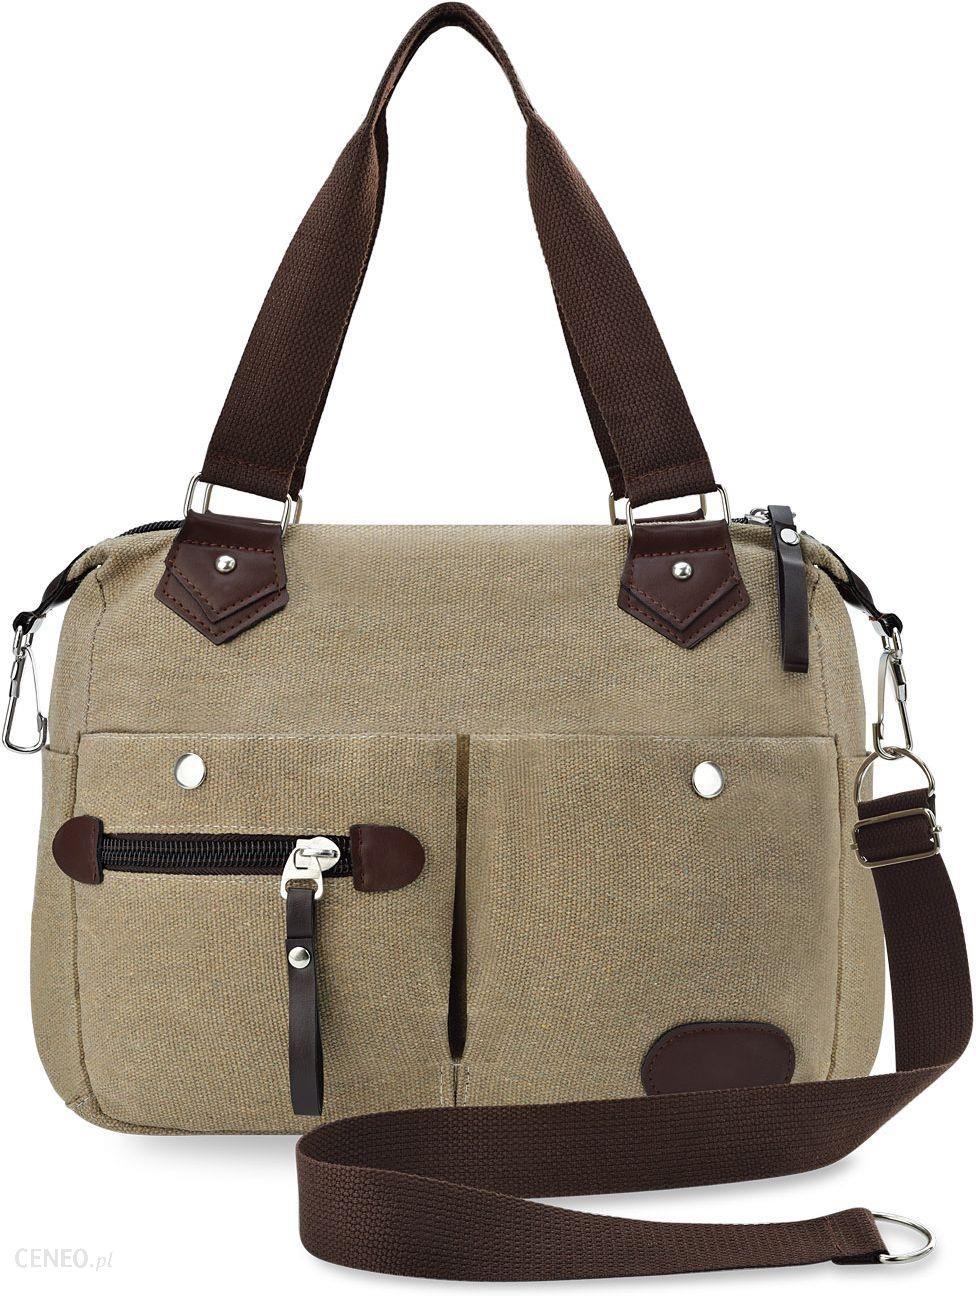 737f132018dcd Solidna lniana torba na ramię płócienna torebka damska luźna shopperka z  kieszonkami - beżowy - zdjęcie